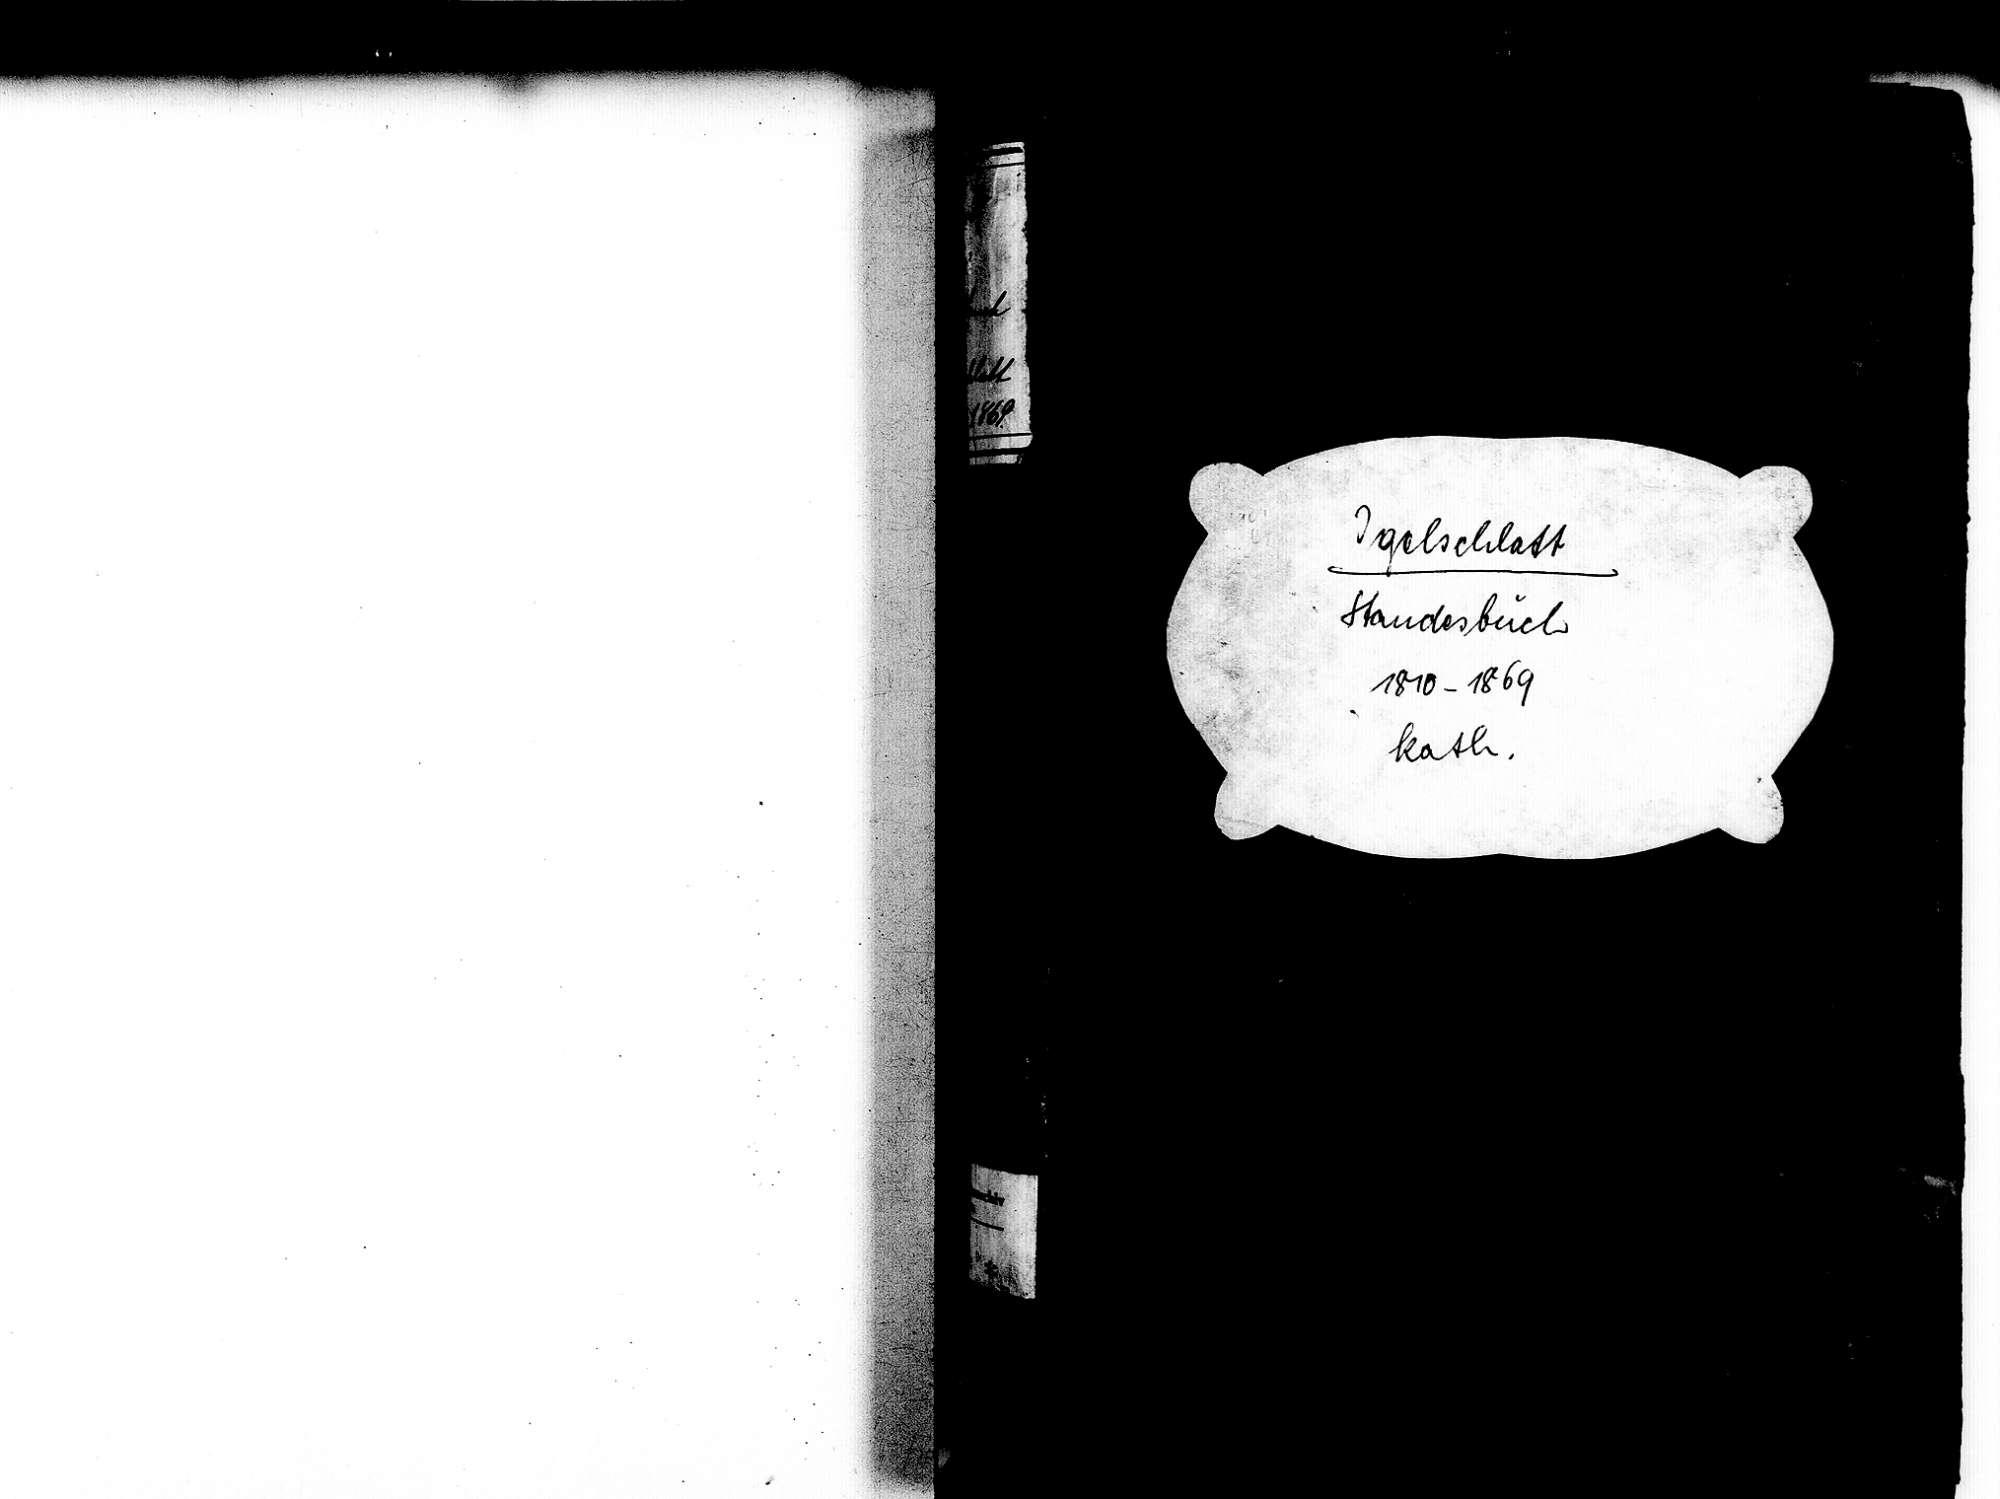 Igelschlatt, Birkendof Ühlingen-Birkendorf WT; Katholische Gemeinde: Standesbuch 1810-1869, Bild 2